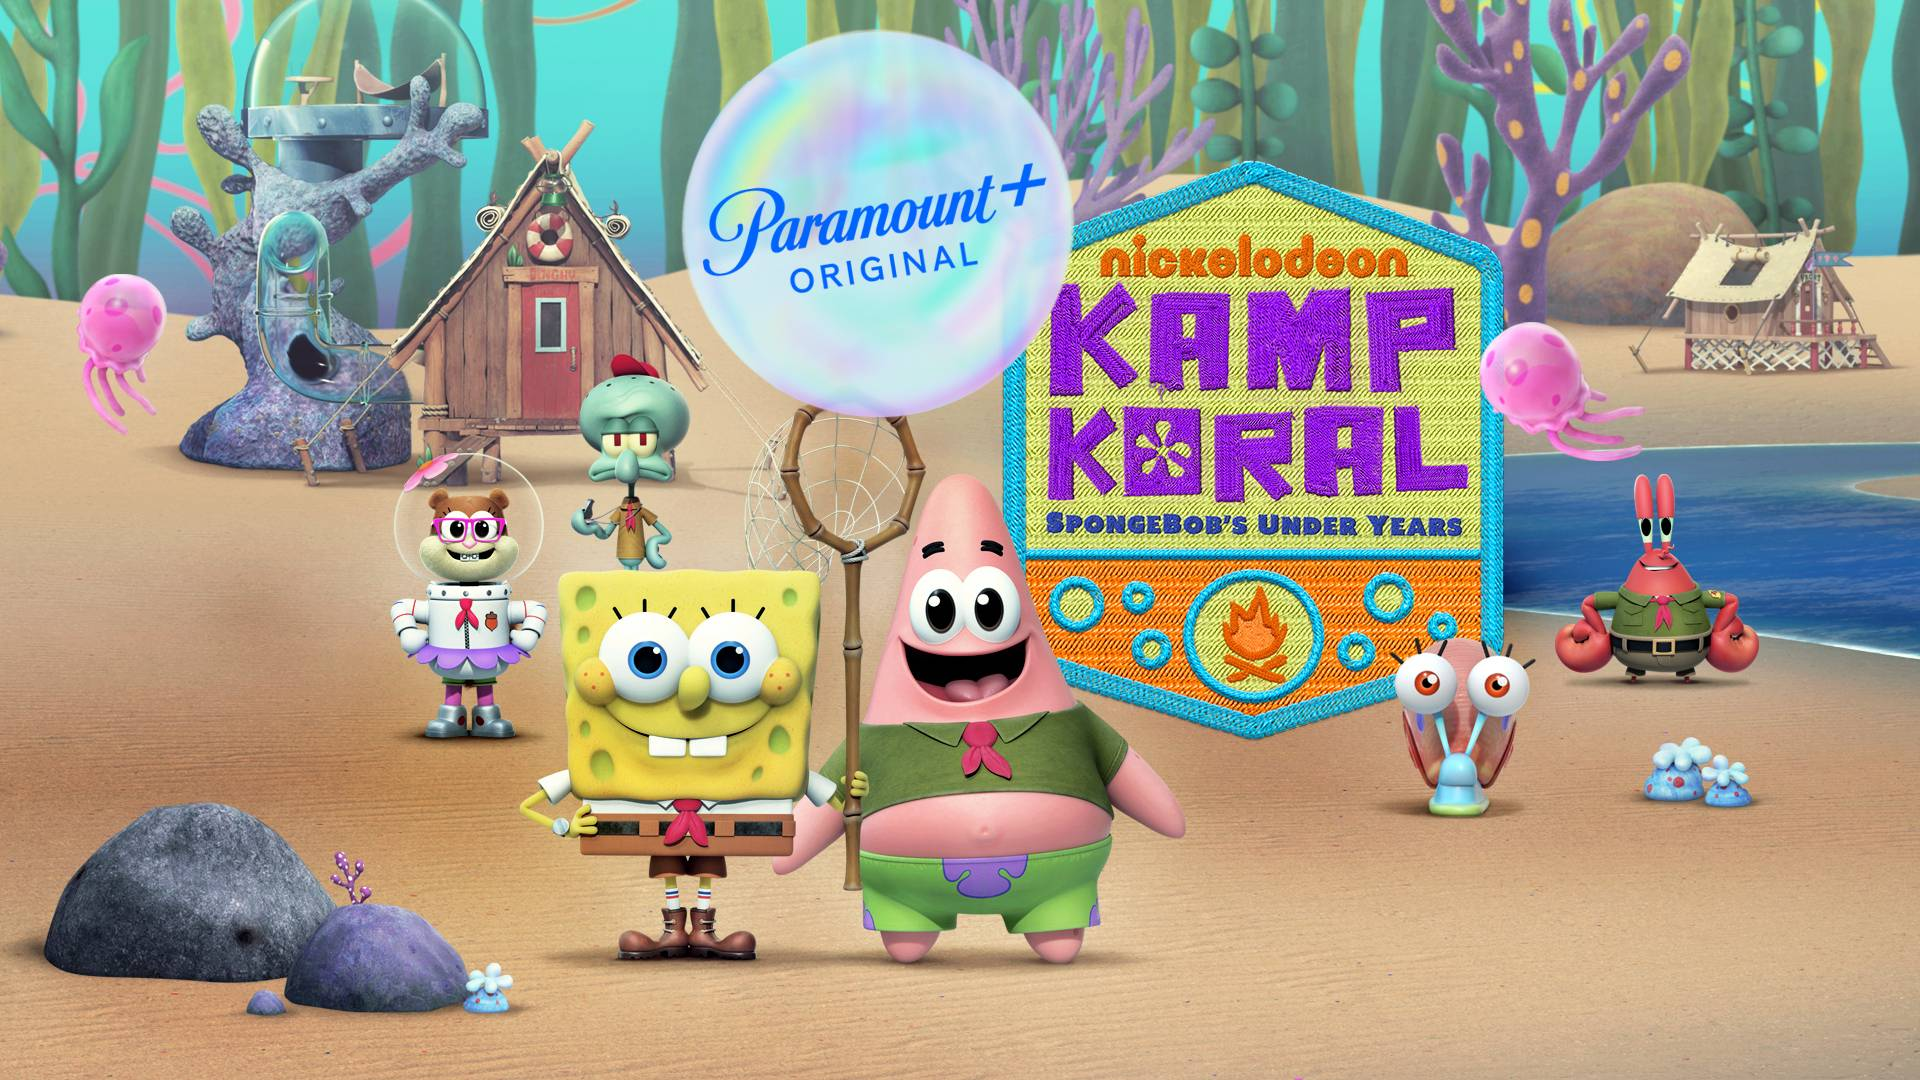 Kamp Koral SpongeBob spinoff